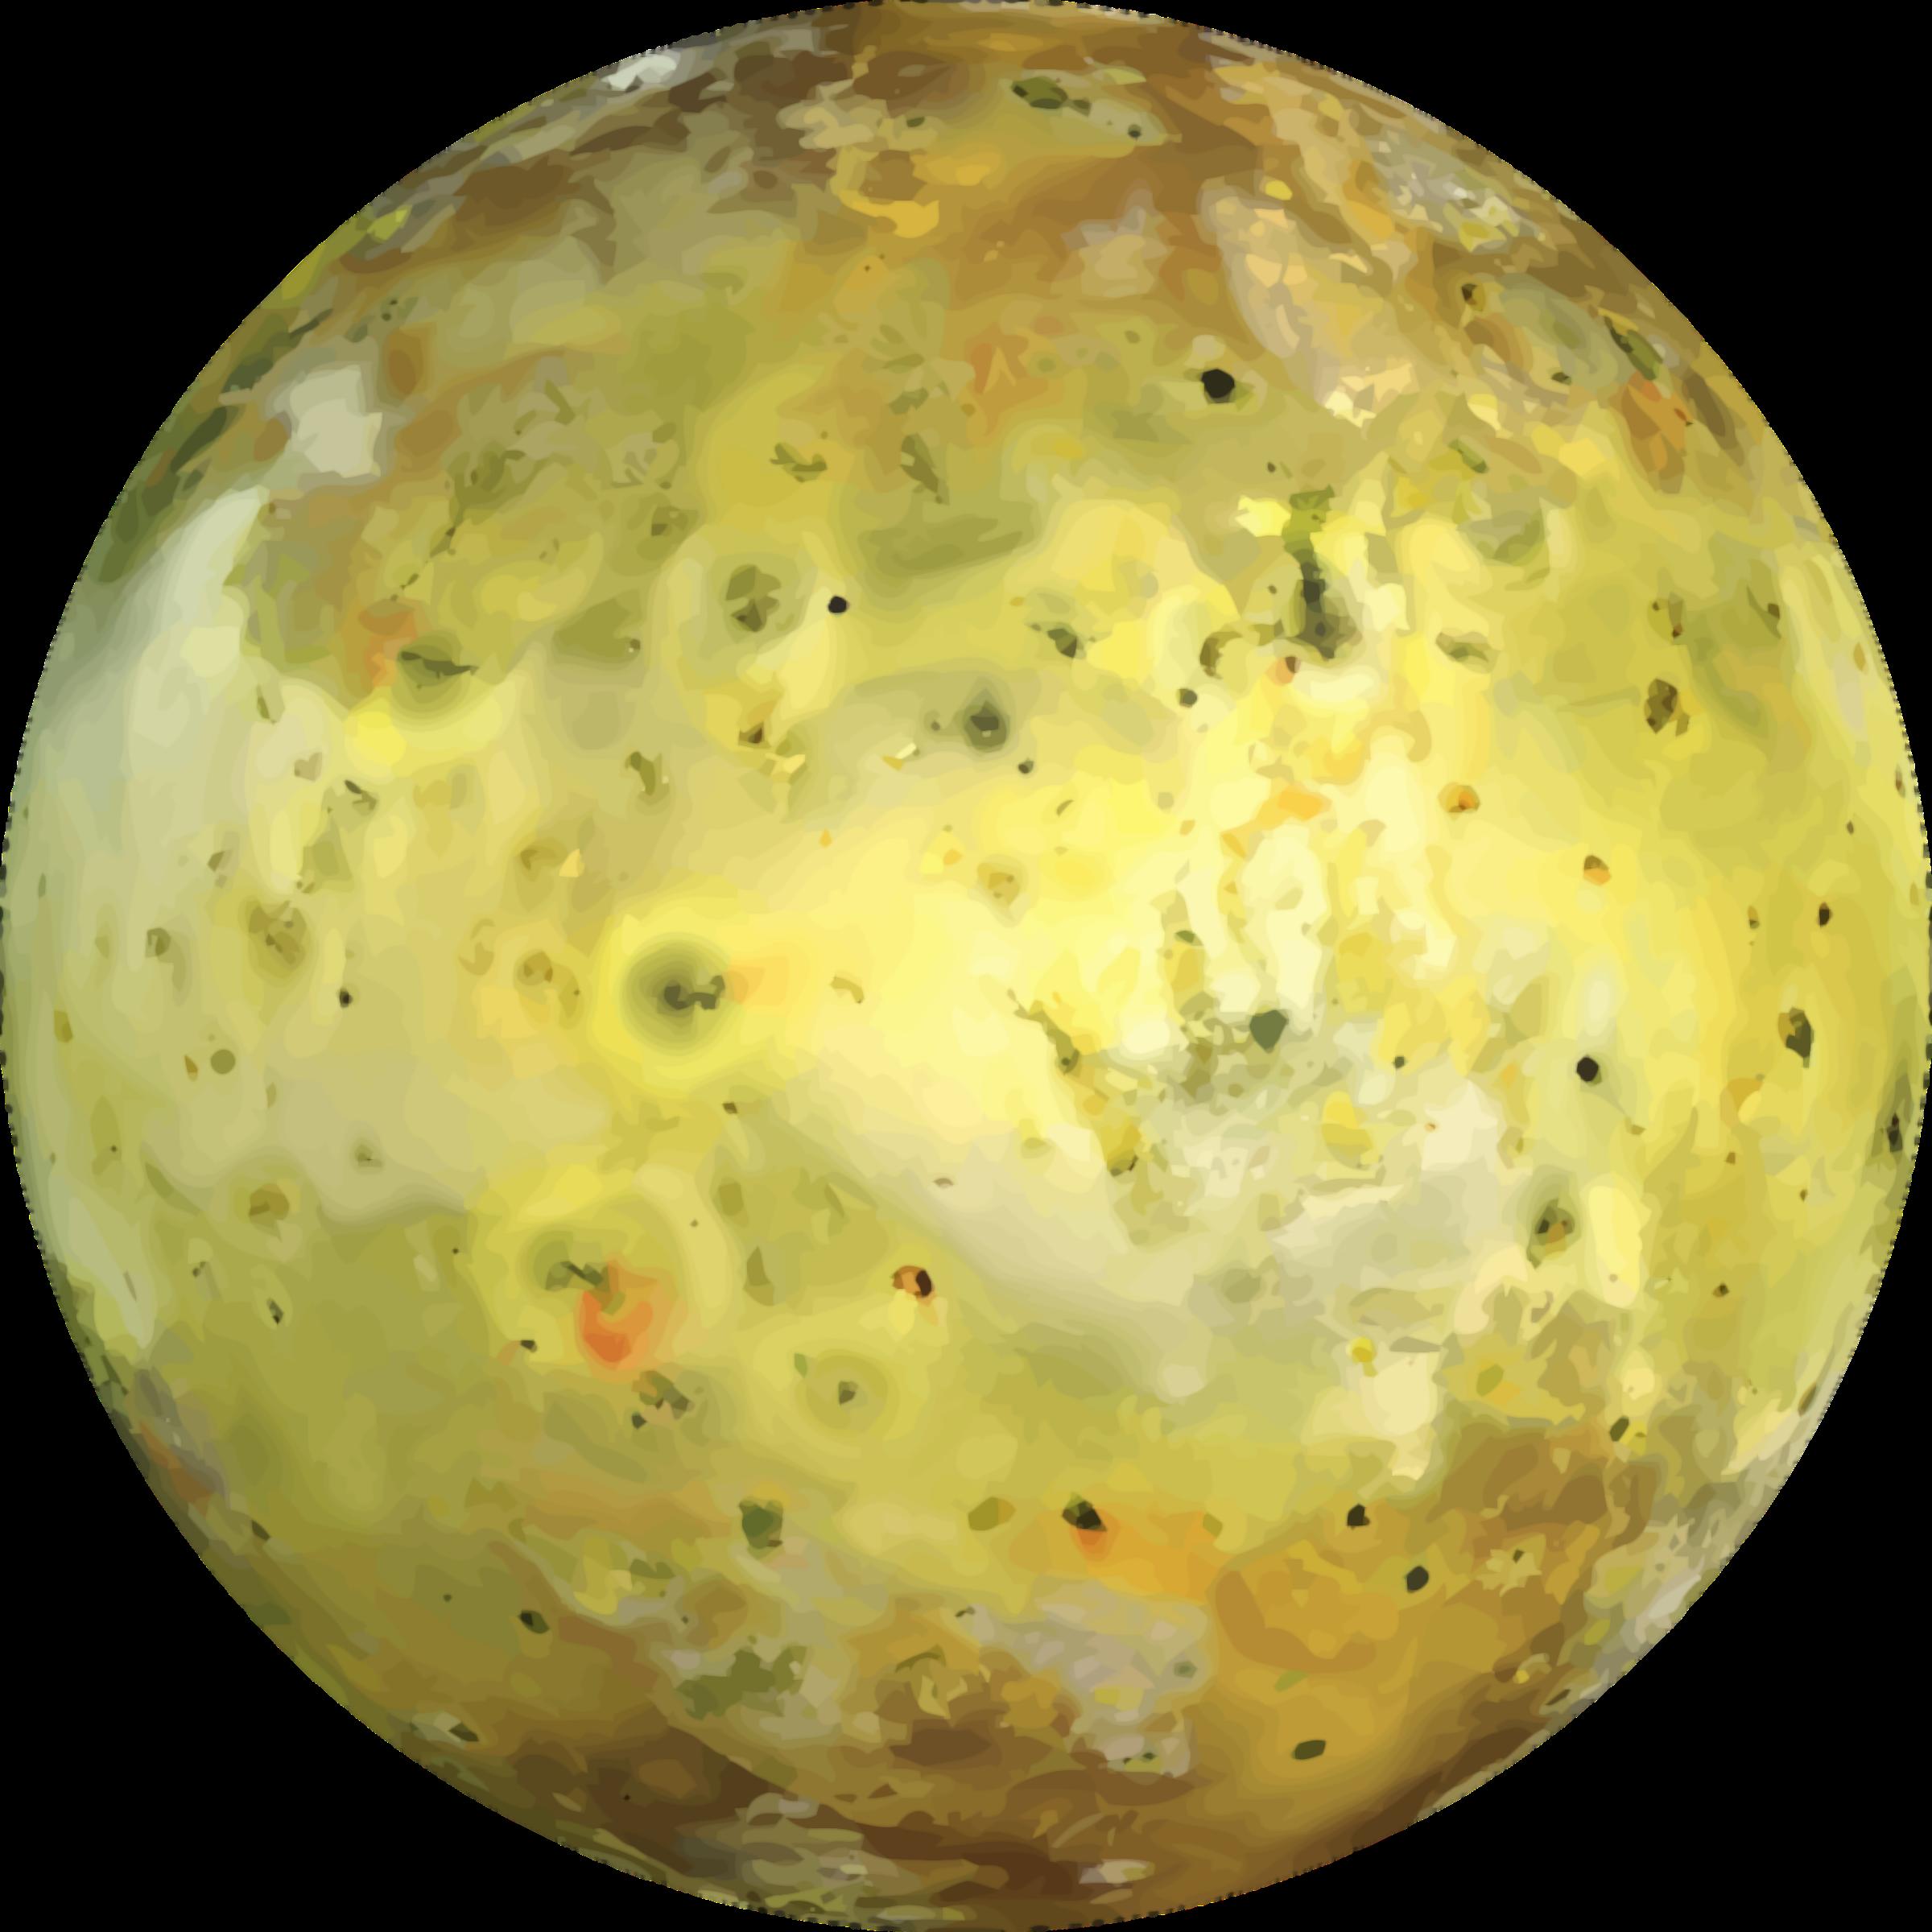 Clipart moon yellow. Jupiter s io big